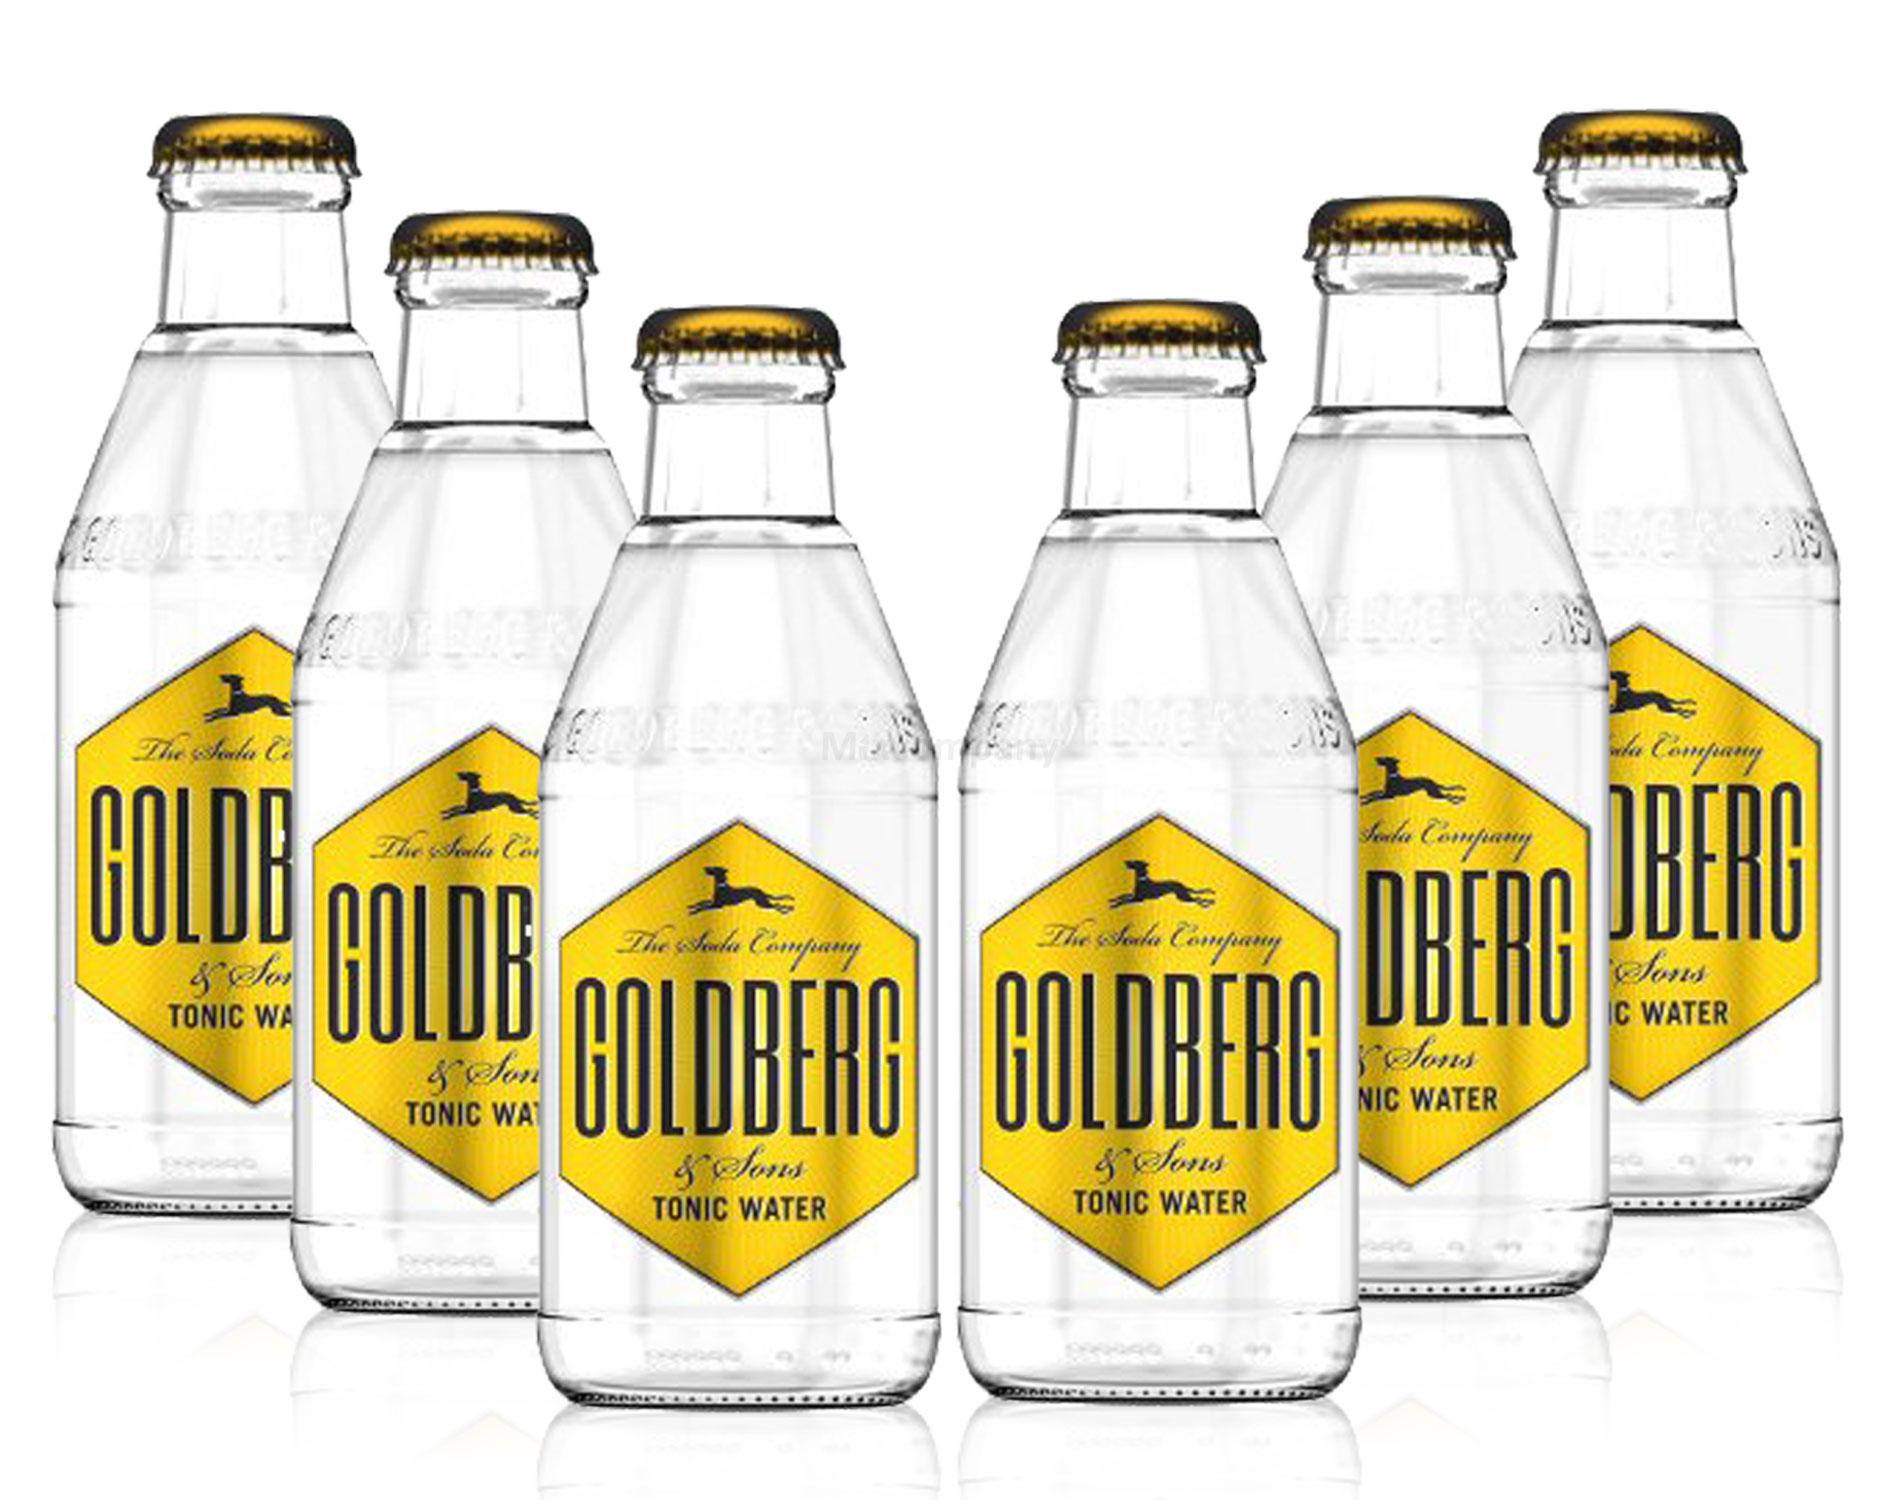 Goldberg Tonic Water Set - 6x 200ml inkl. Pfand MEHRWEG